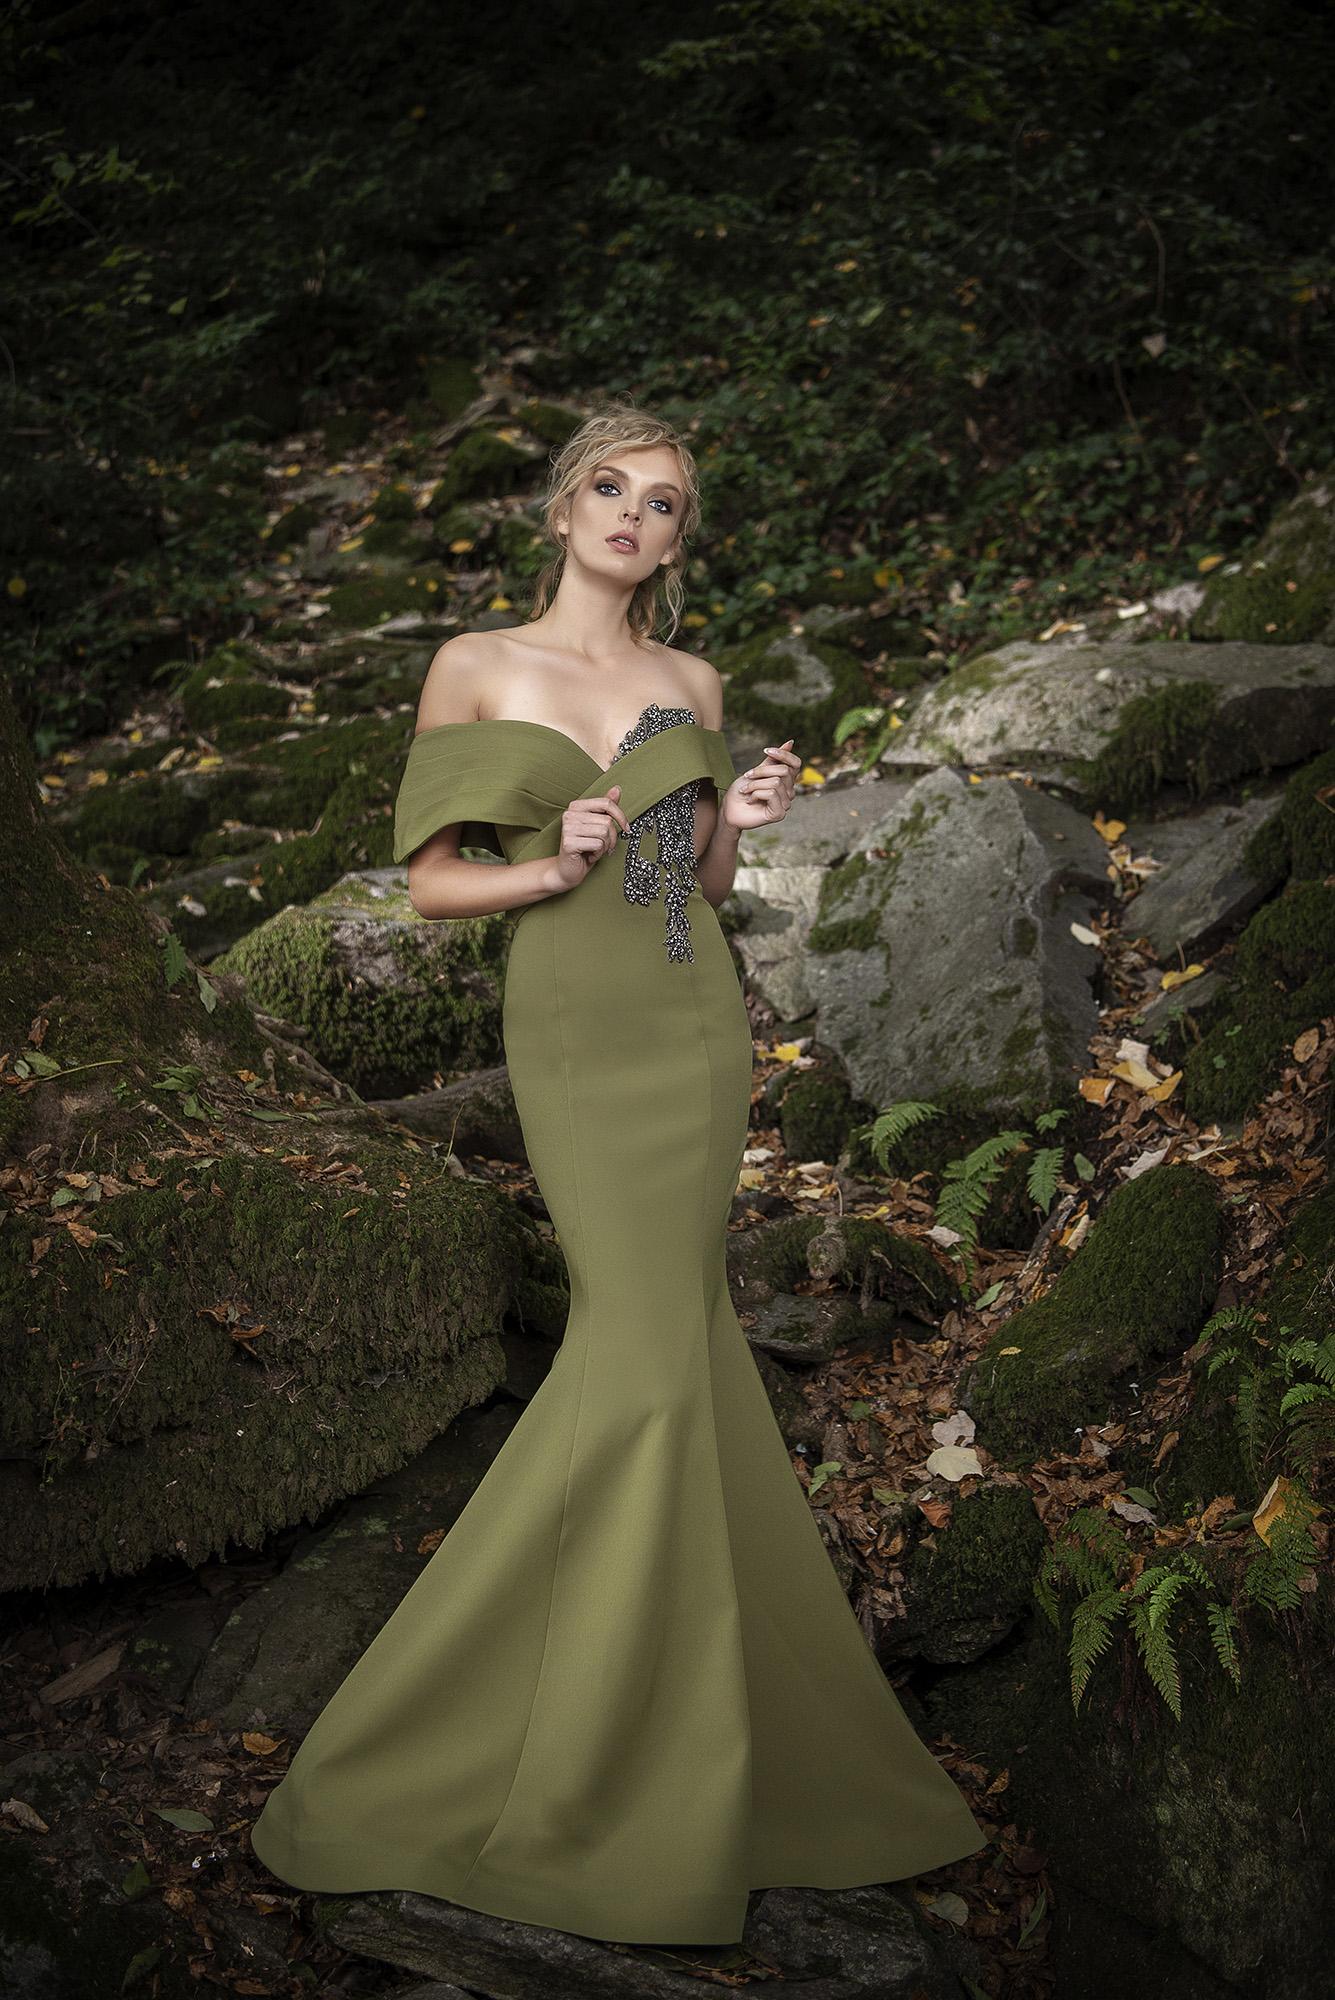 Moda_Fotograflari_Fashion_Ugur_Bektas_00015.jpg